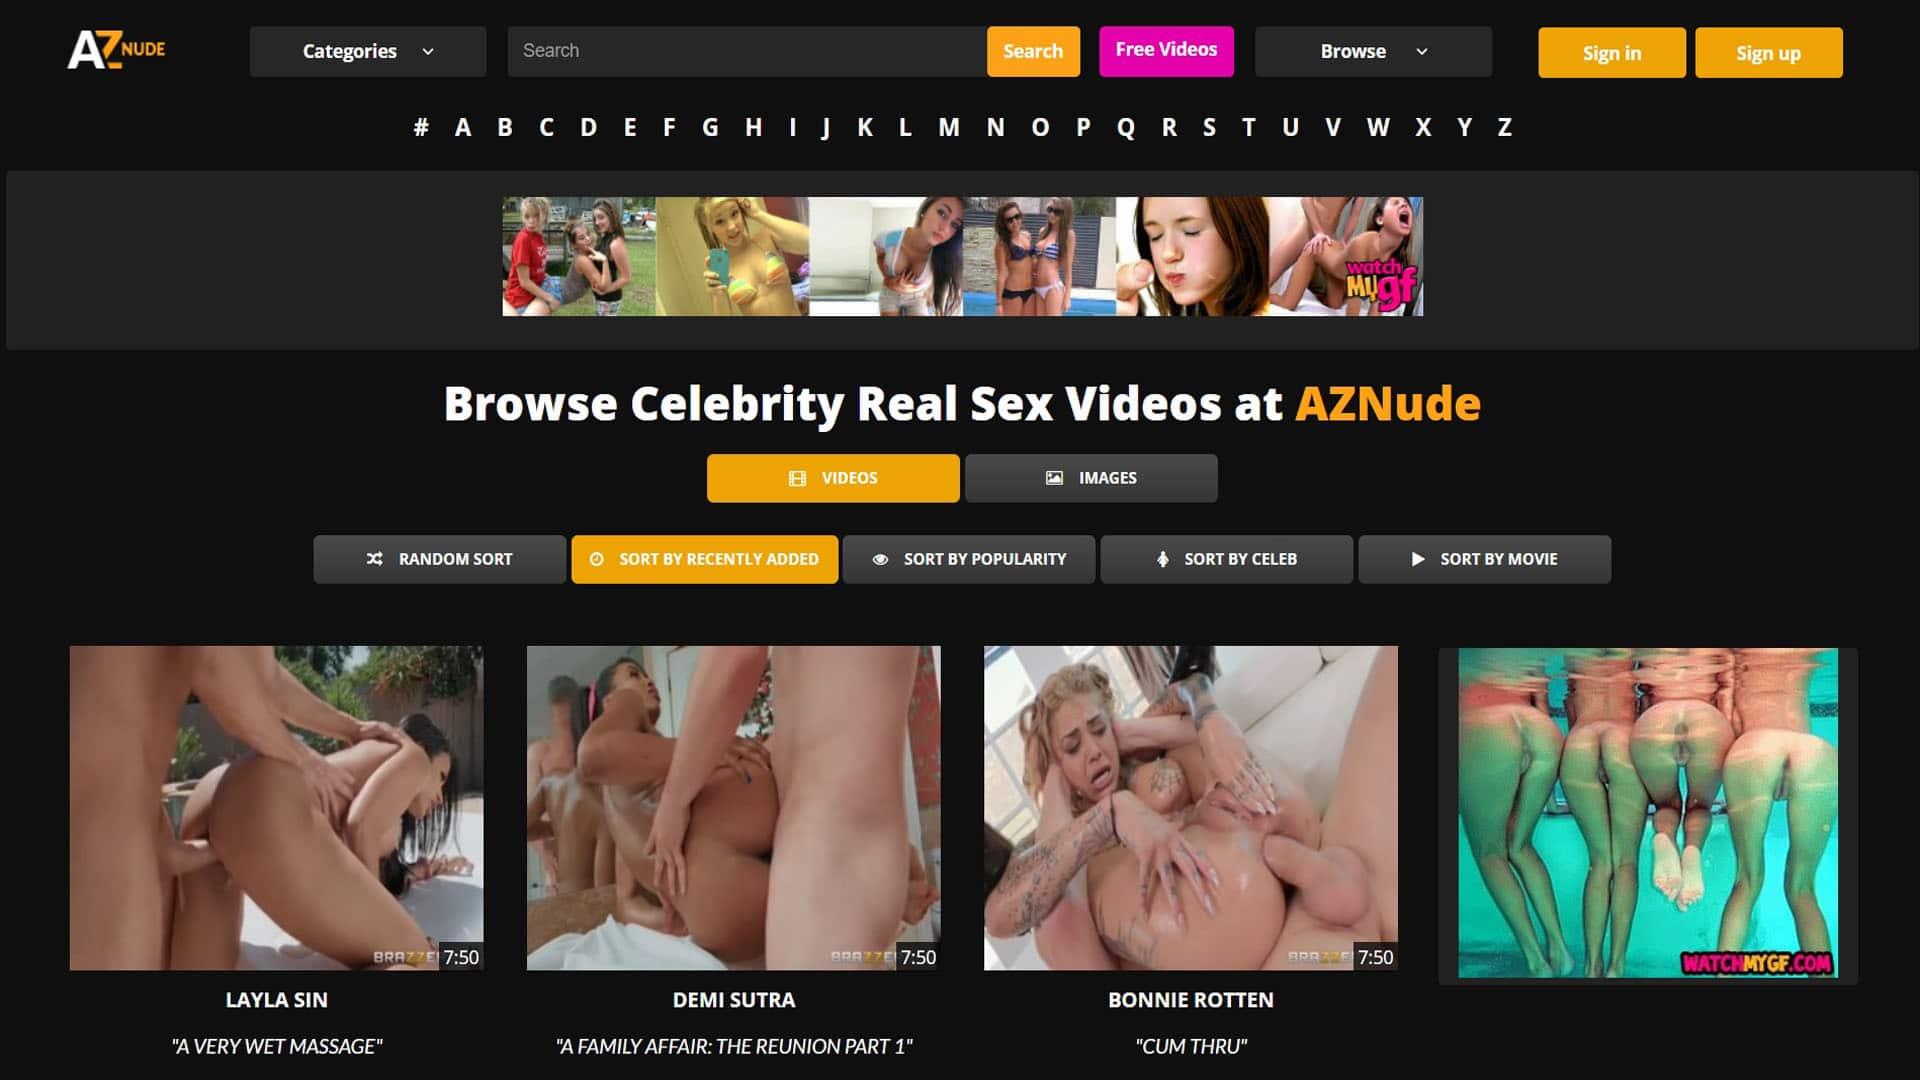 AZNude Celebrity Real Sex Videos